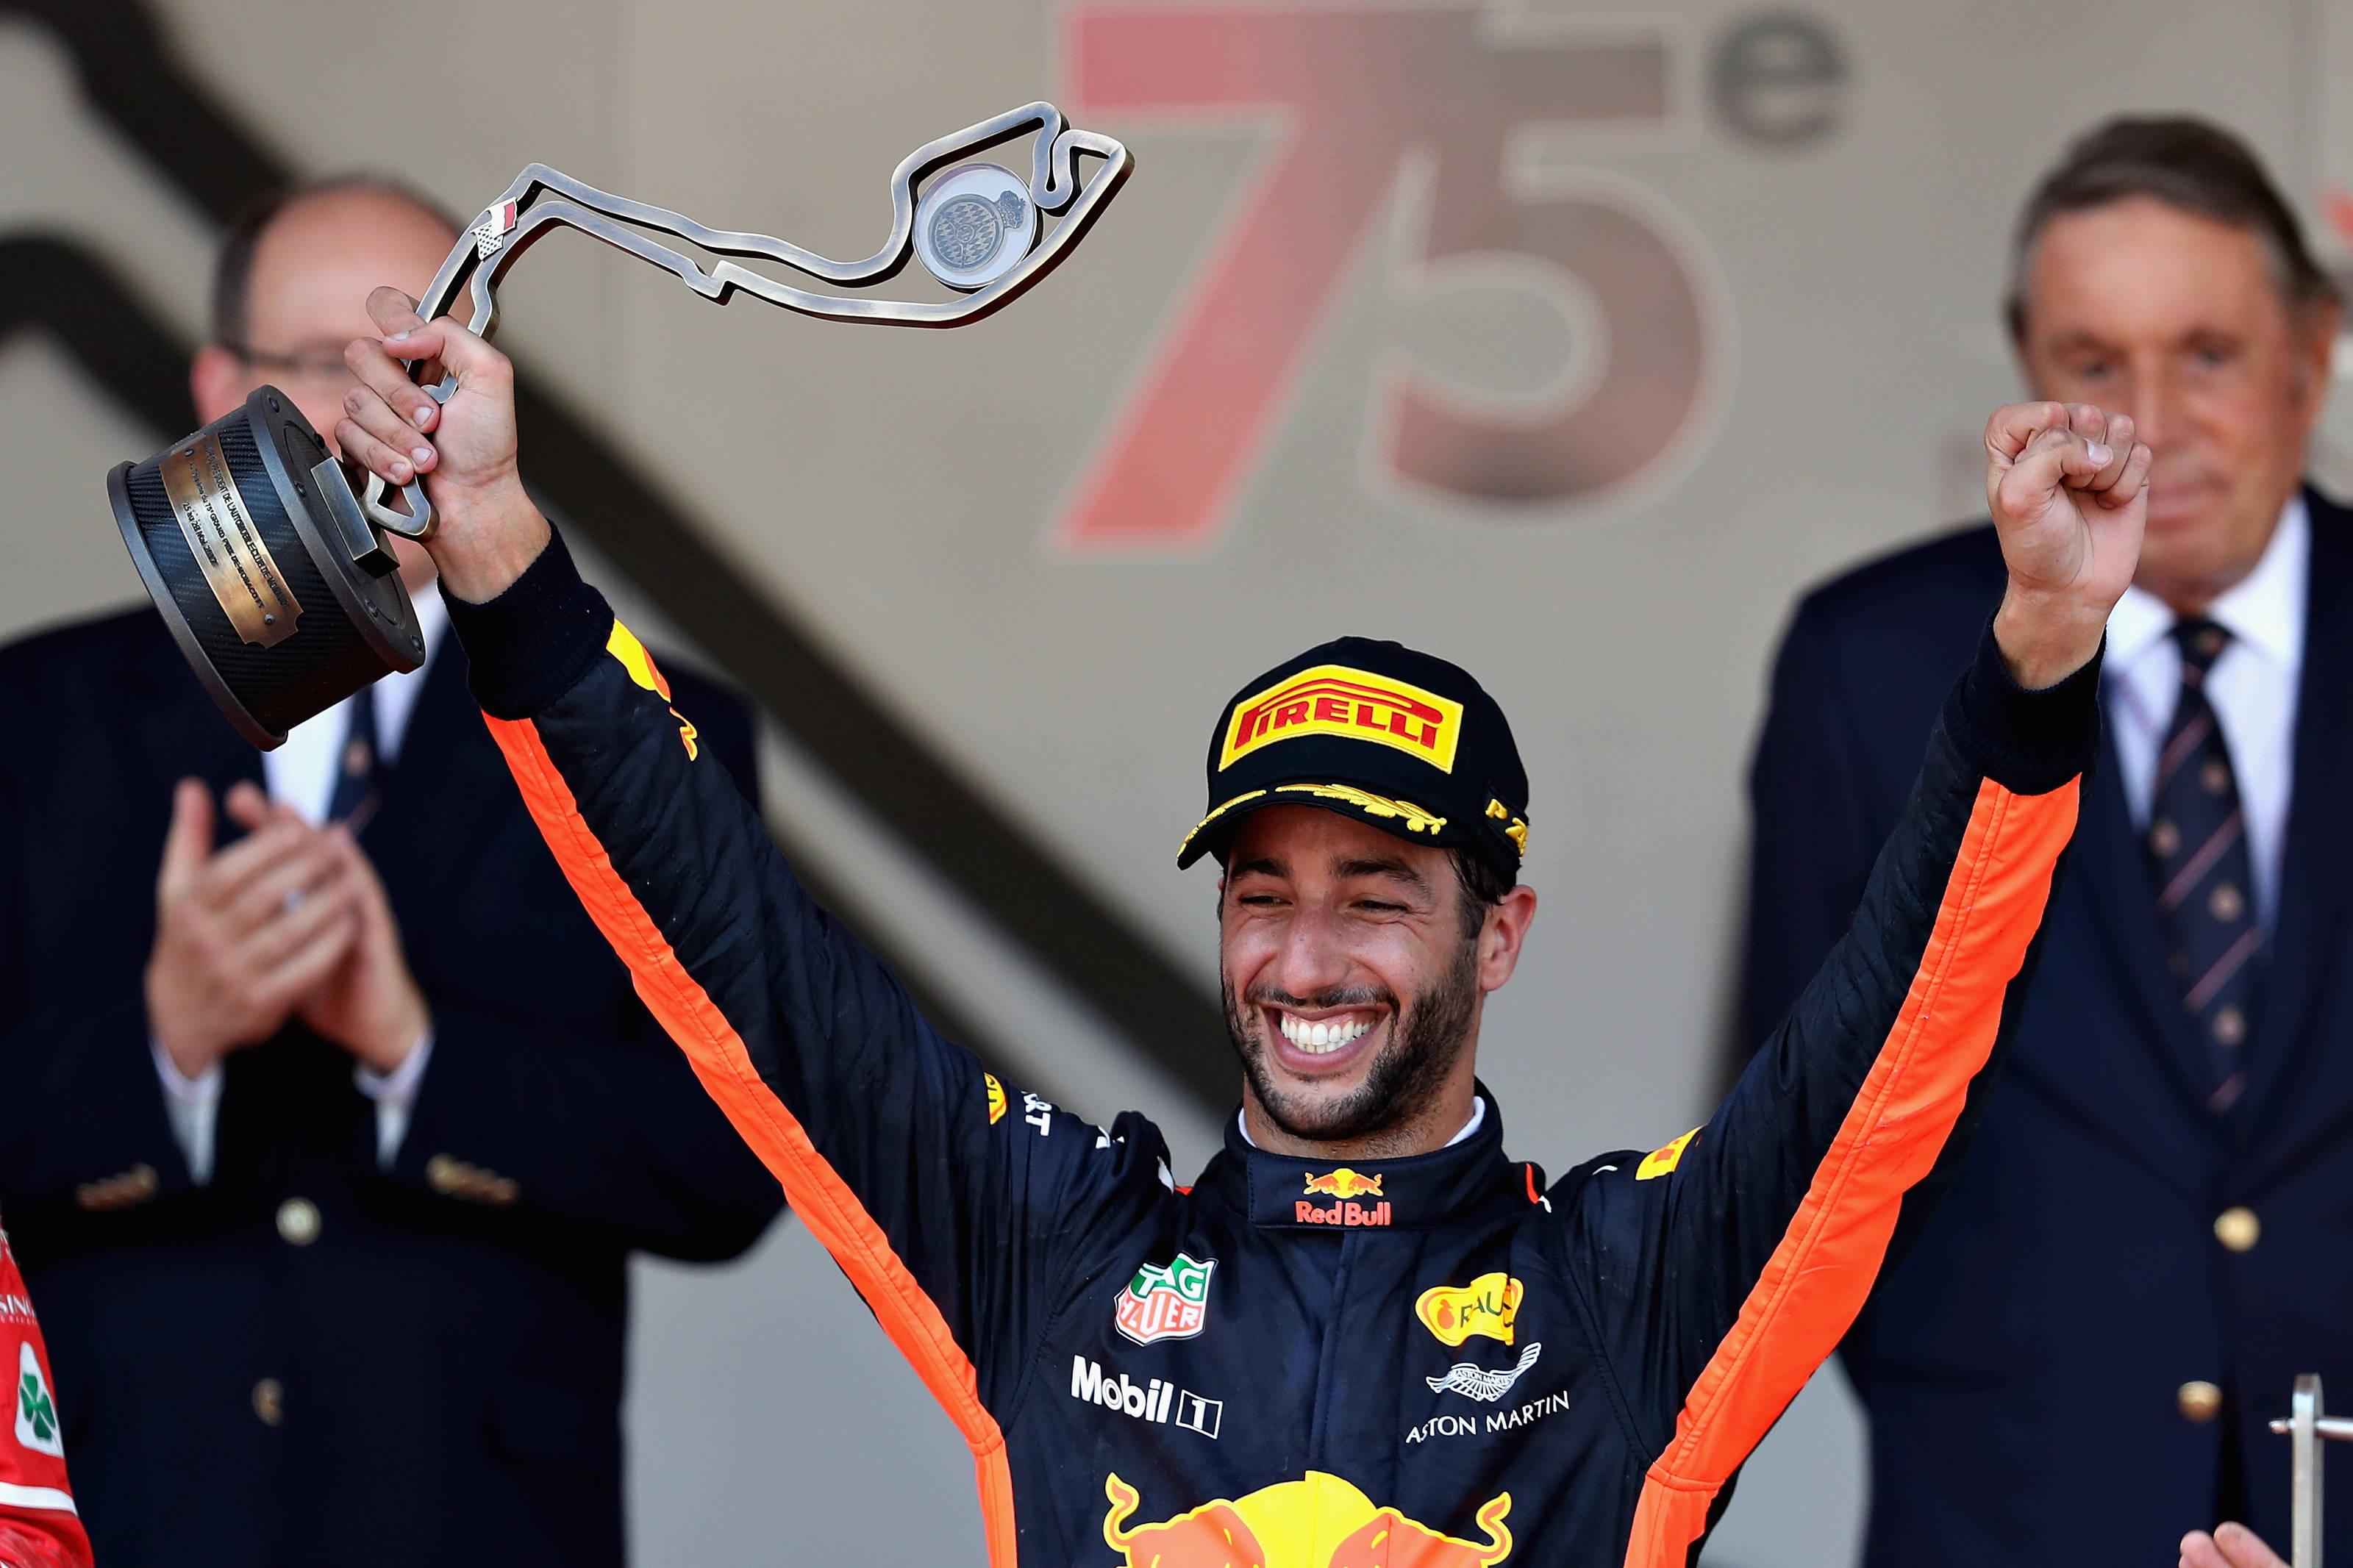 Stupid mistake cost me, says Daniel Ricciardo